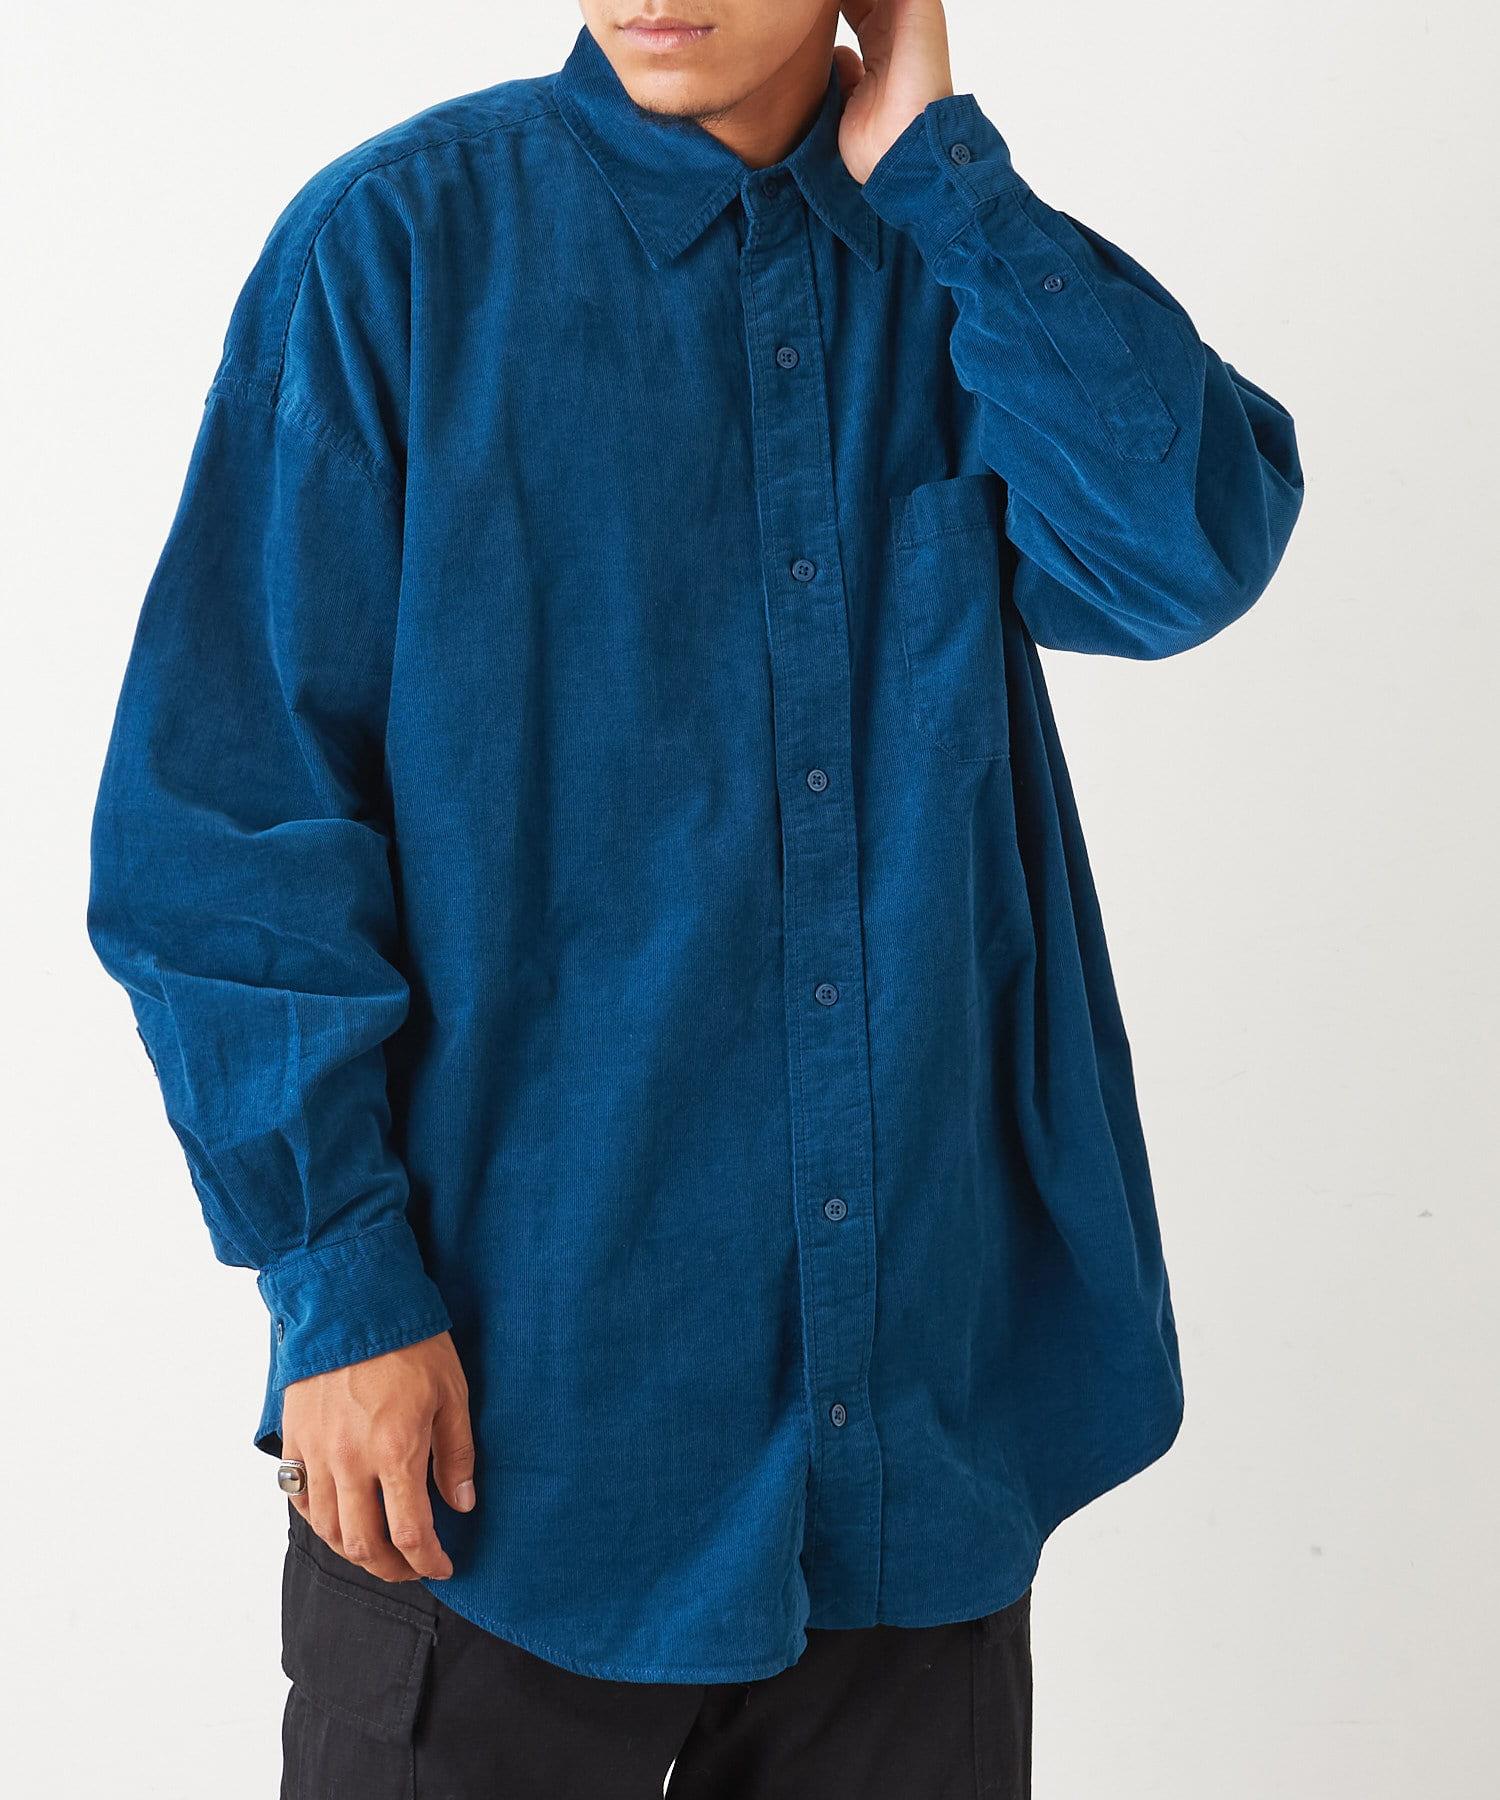 Discoat(ディスコート) メンズ 28Wコールビックシャツ ミッドナイトブルー